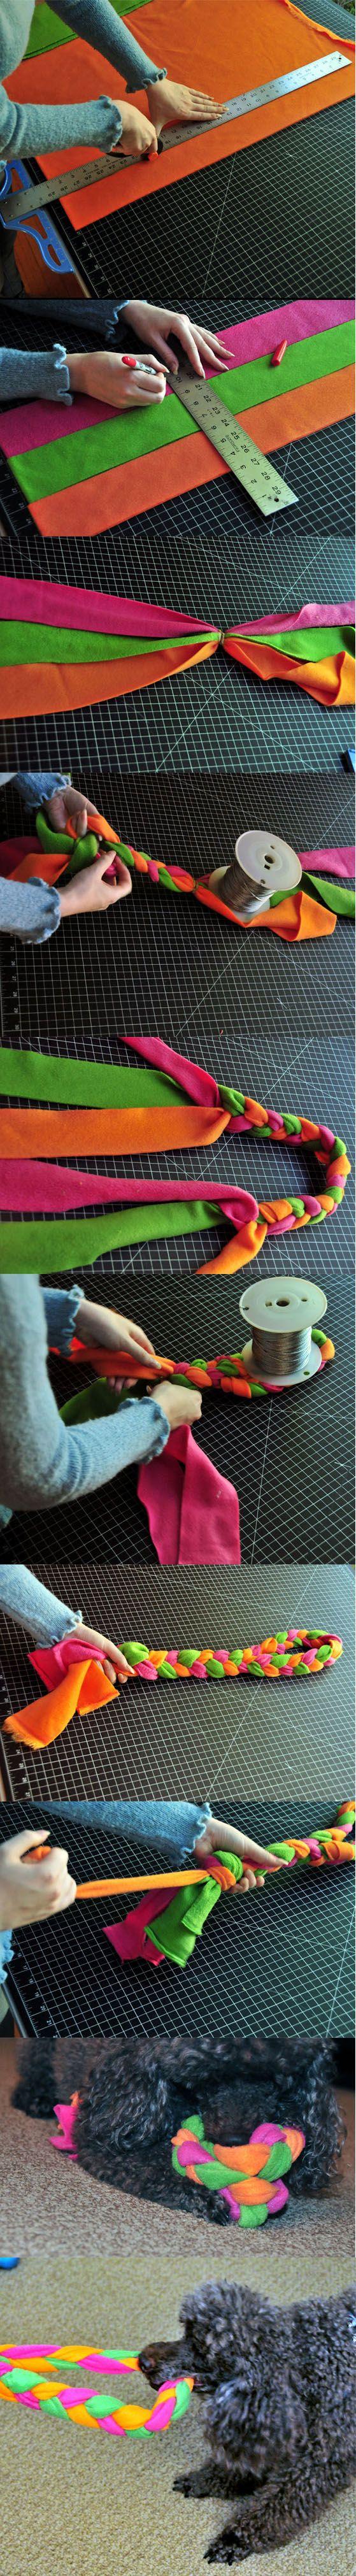 tela-juguete-mascota-muy-ingenioso-diy-1                                                                                                                                                                                 Más